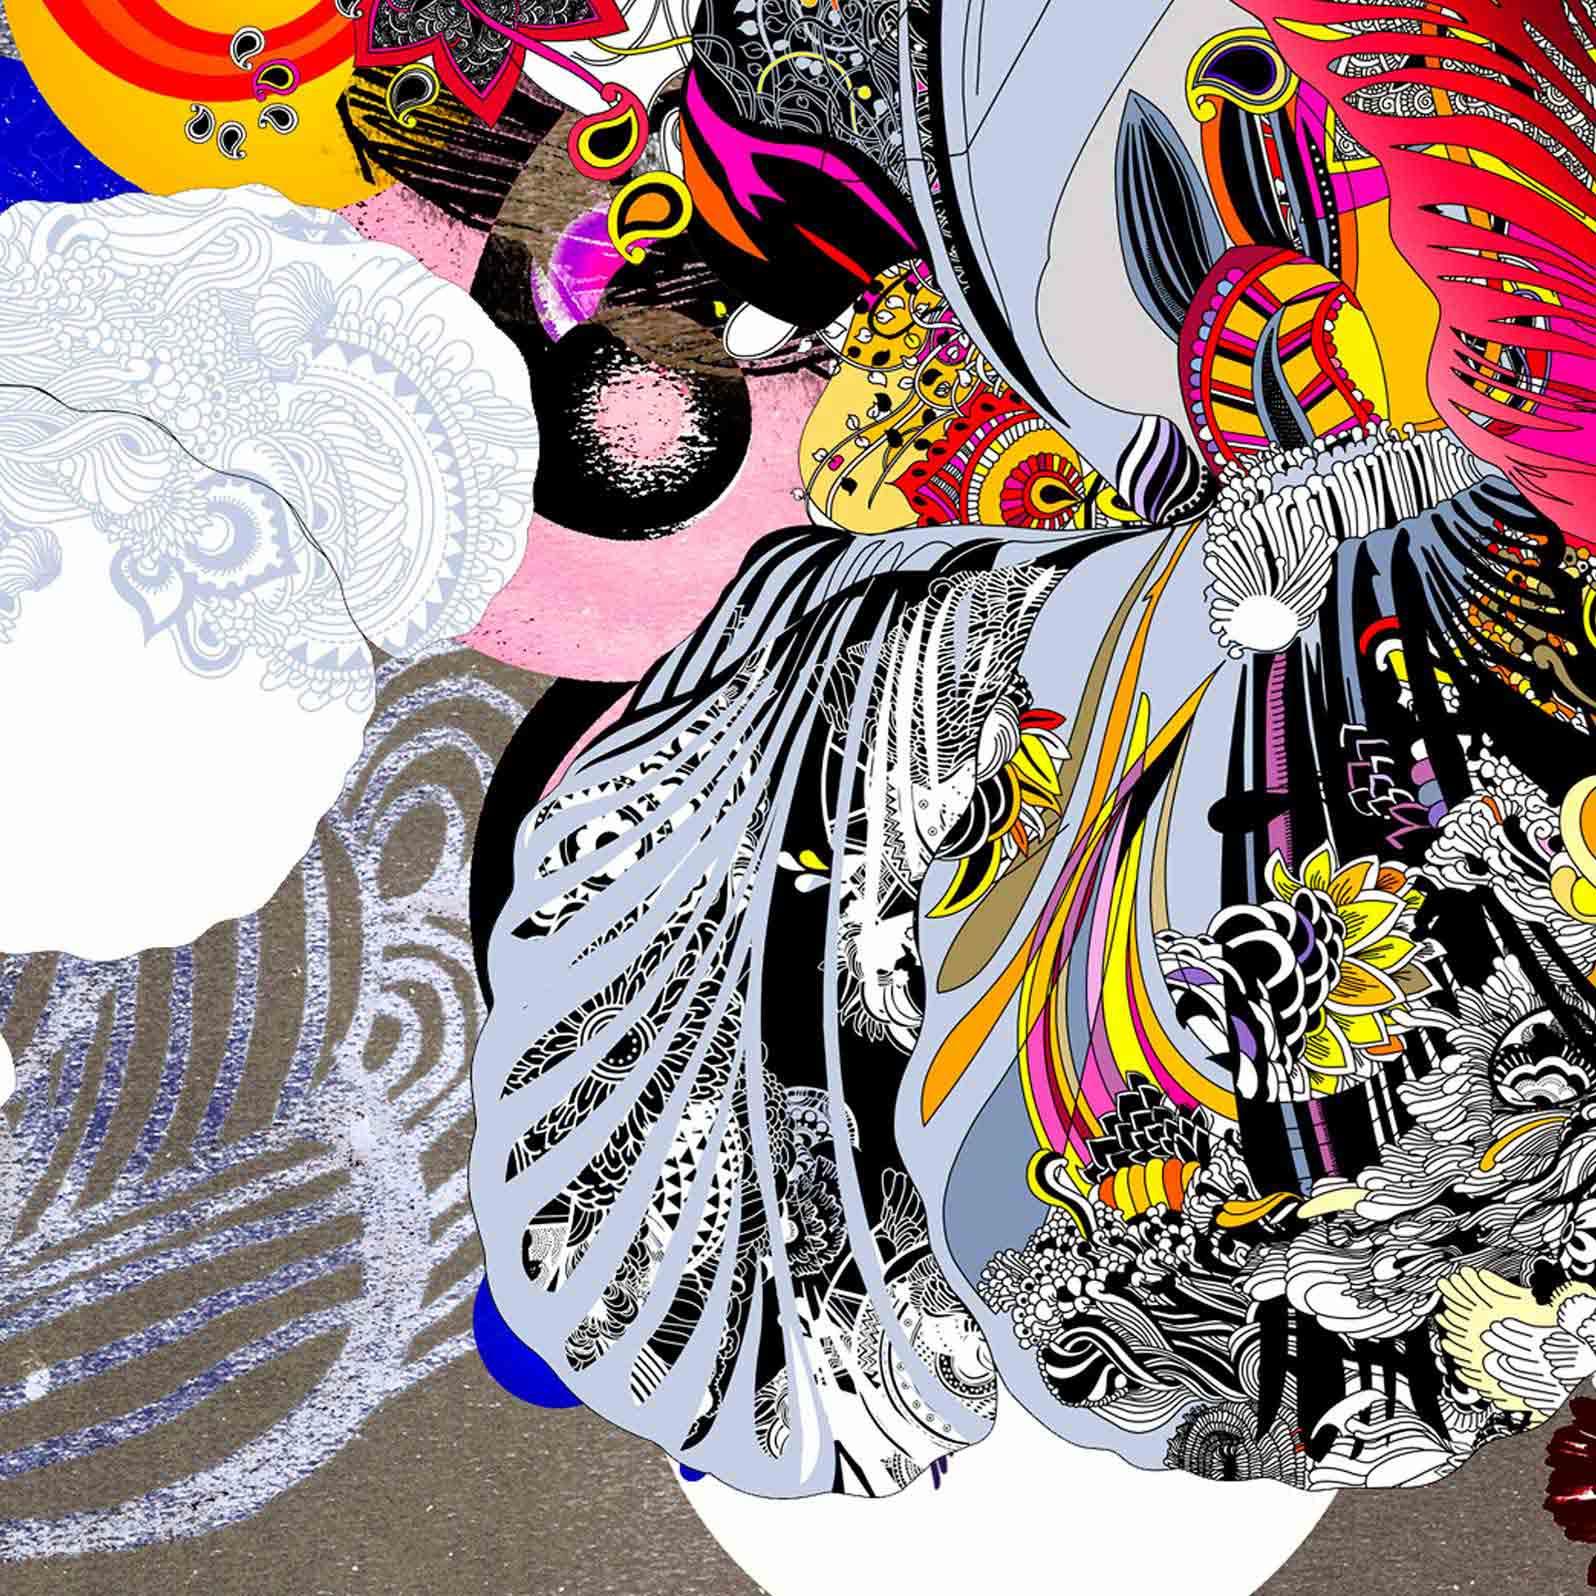 Anca Stefanescu | Hamatreya Digital Art, Print On Canvas